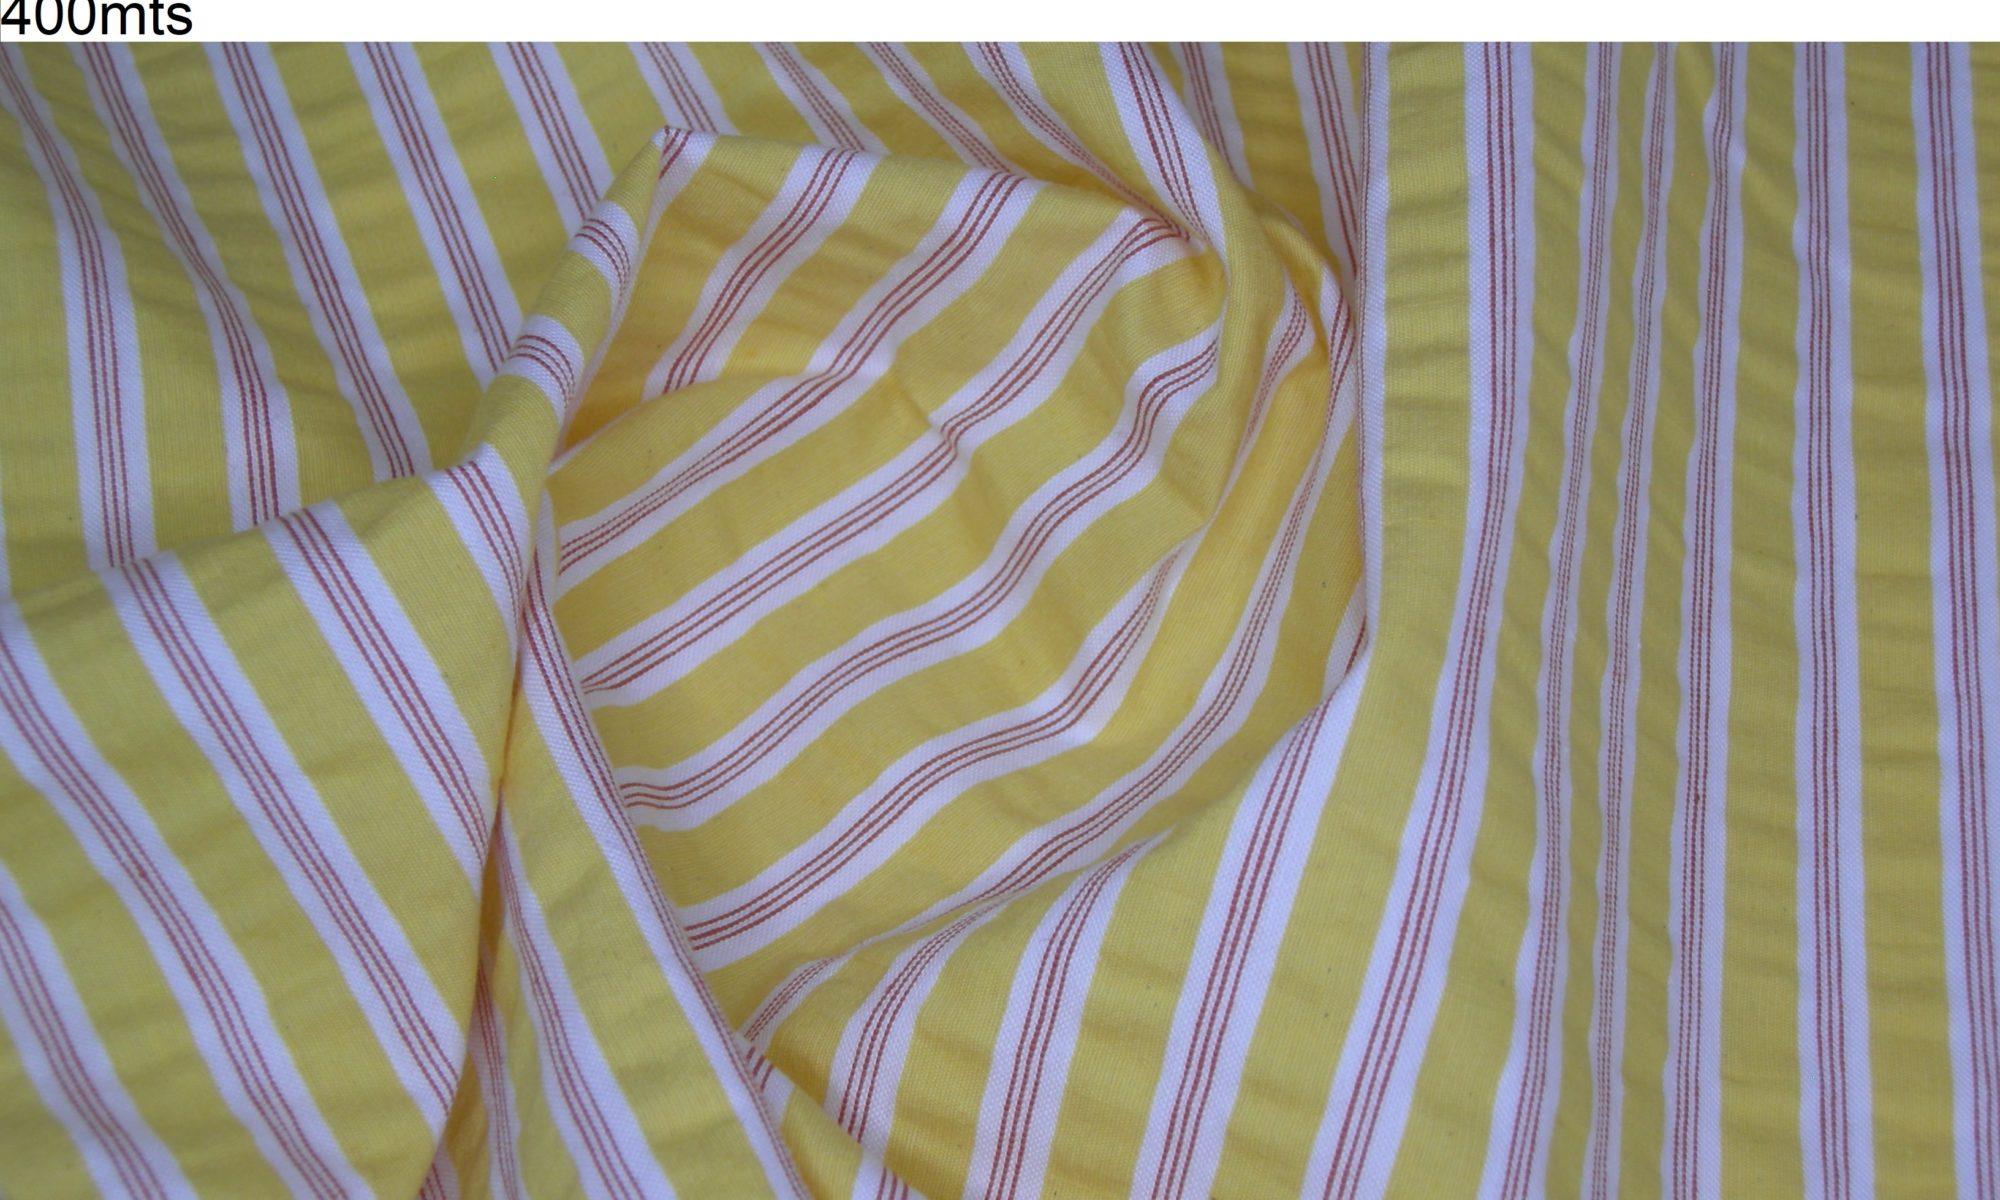 7723 yellow stripe seersucker cotton shir fabric WIDTH cm145 WEIGHT gr215 - gr148 square meter - COMPOSITION 90 Cotton 10 Polyammide - 400mts